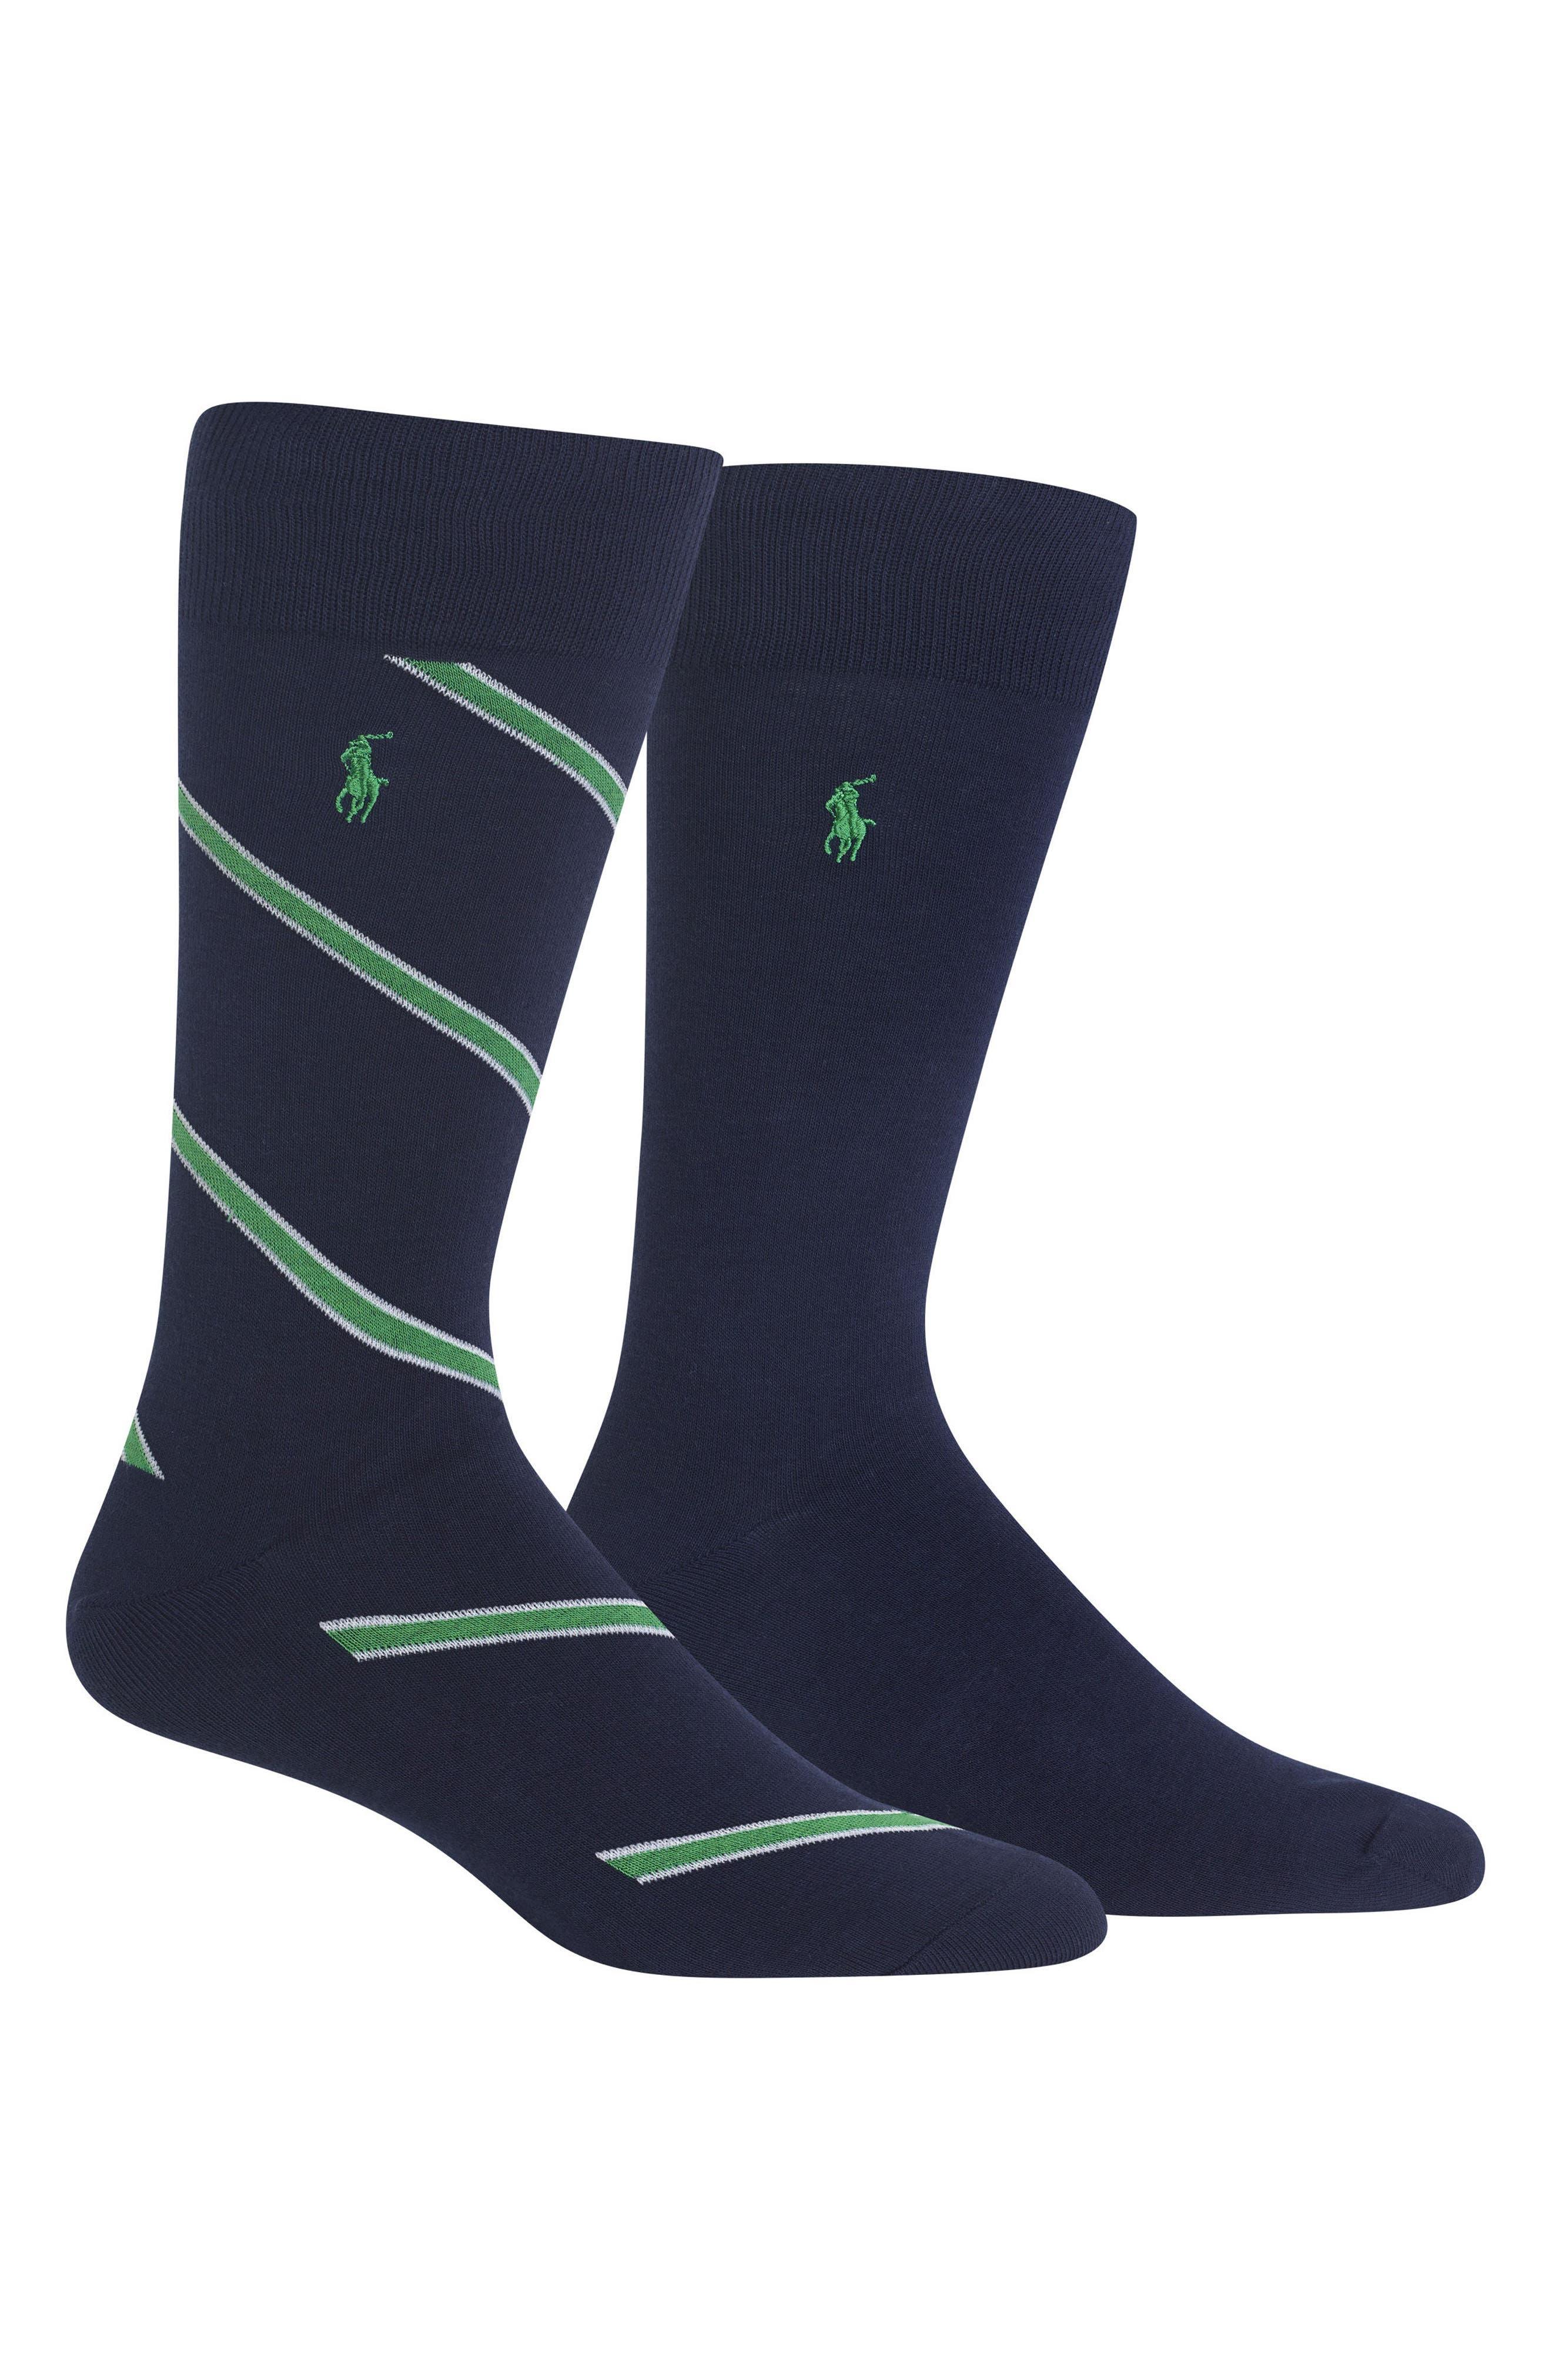 Ralph Lauren 2-Pack Socks,                         Main,                         color, Navy